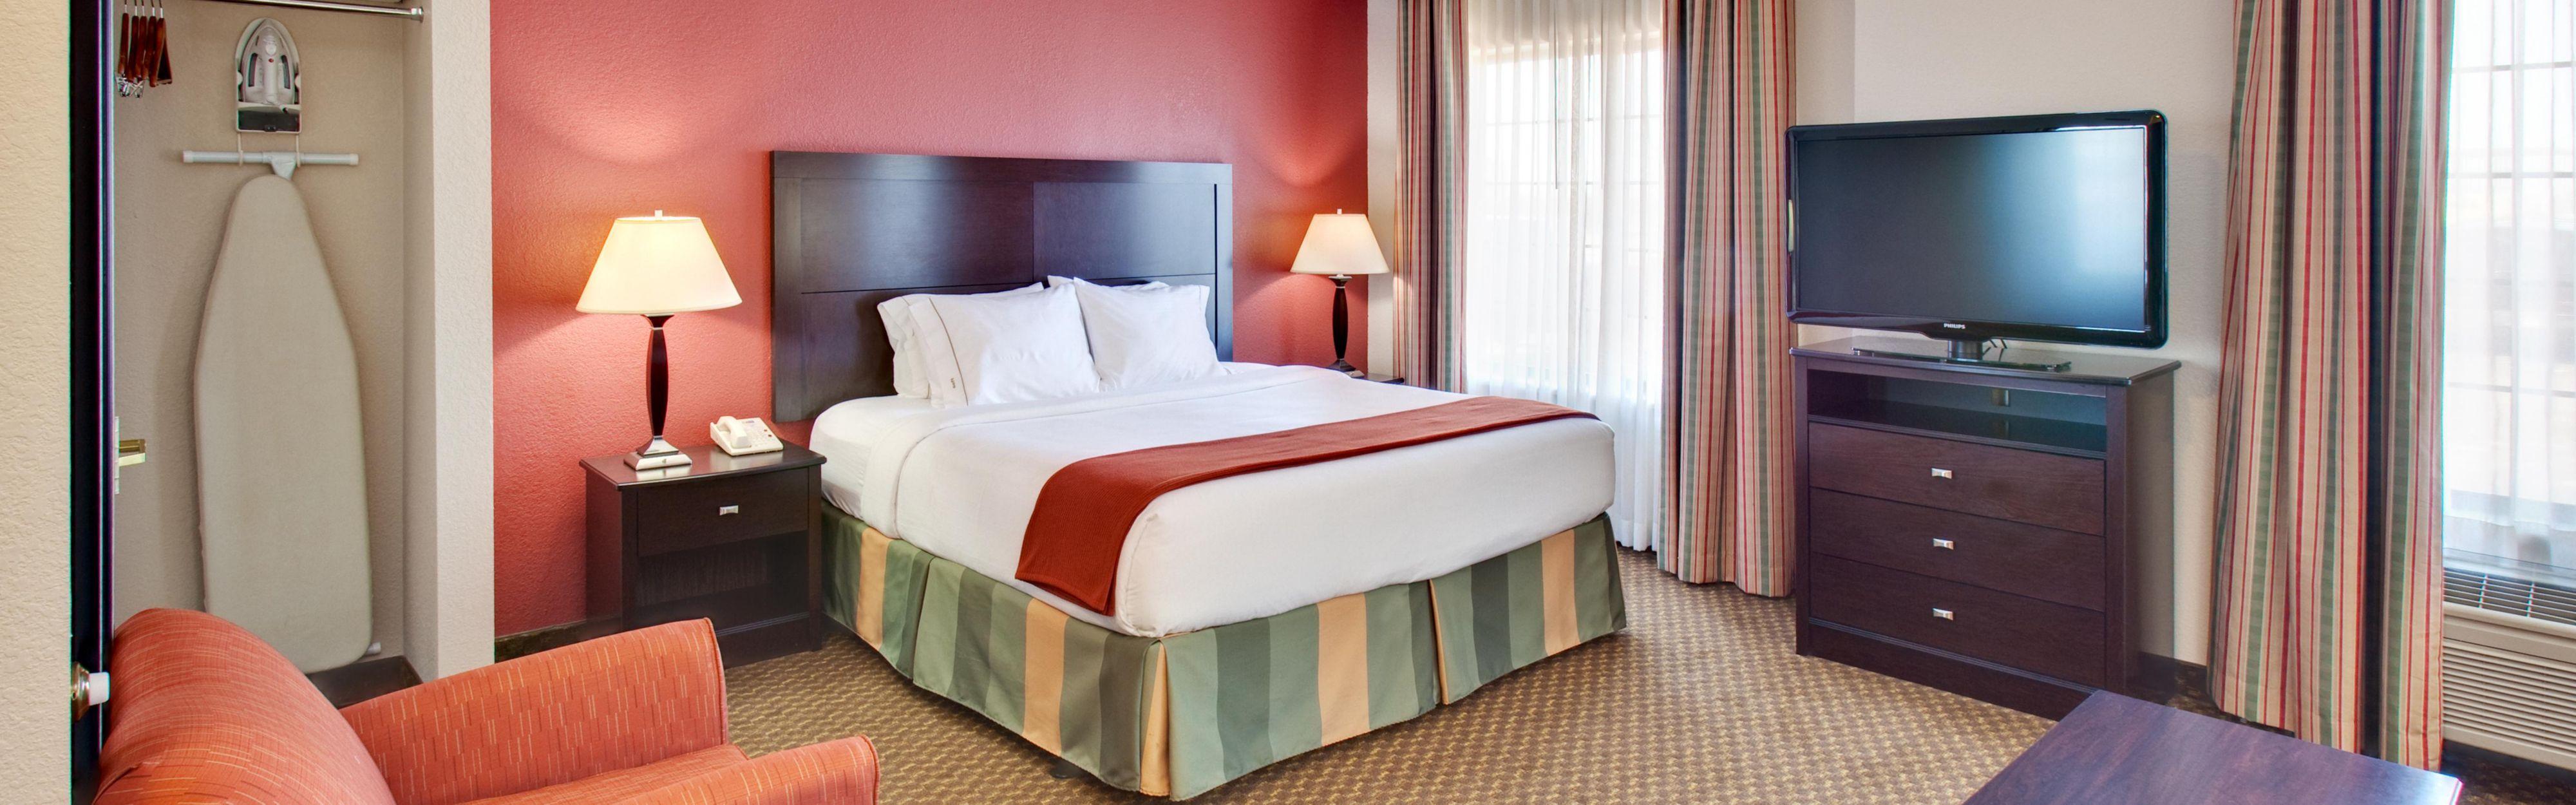 Holiday Inn Express & Suites Pleasant Prairie / Kenosha image 1